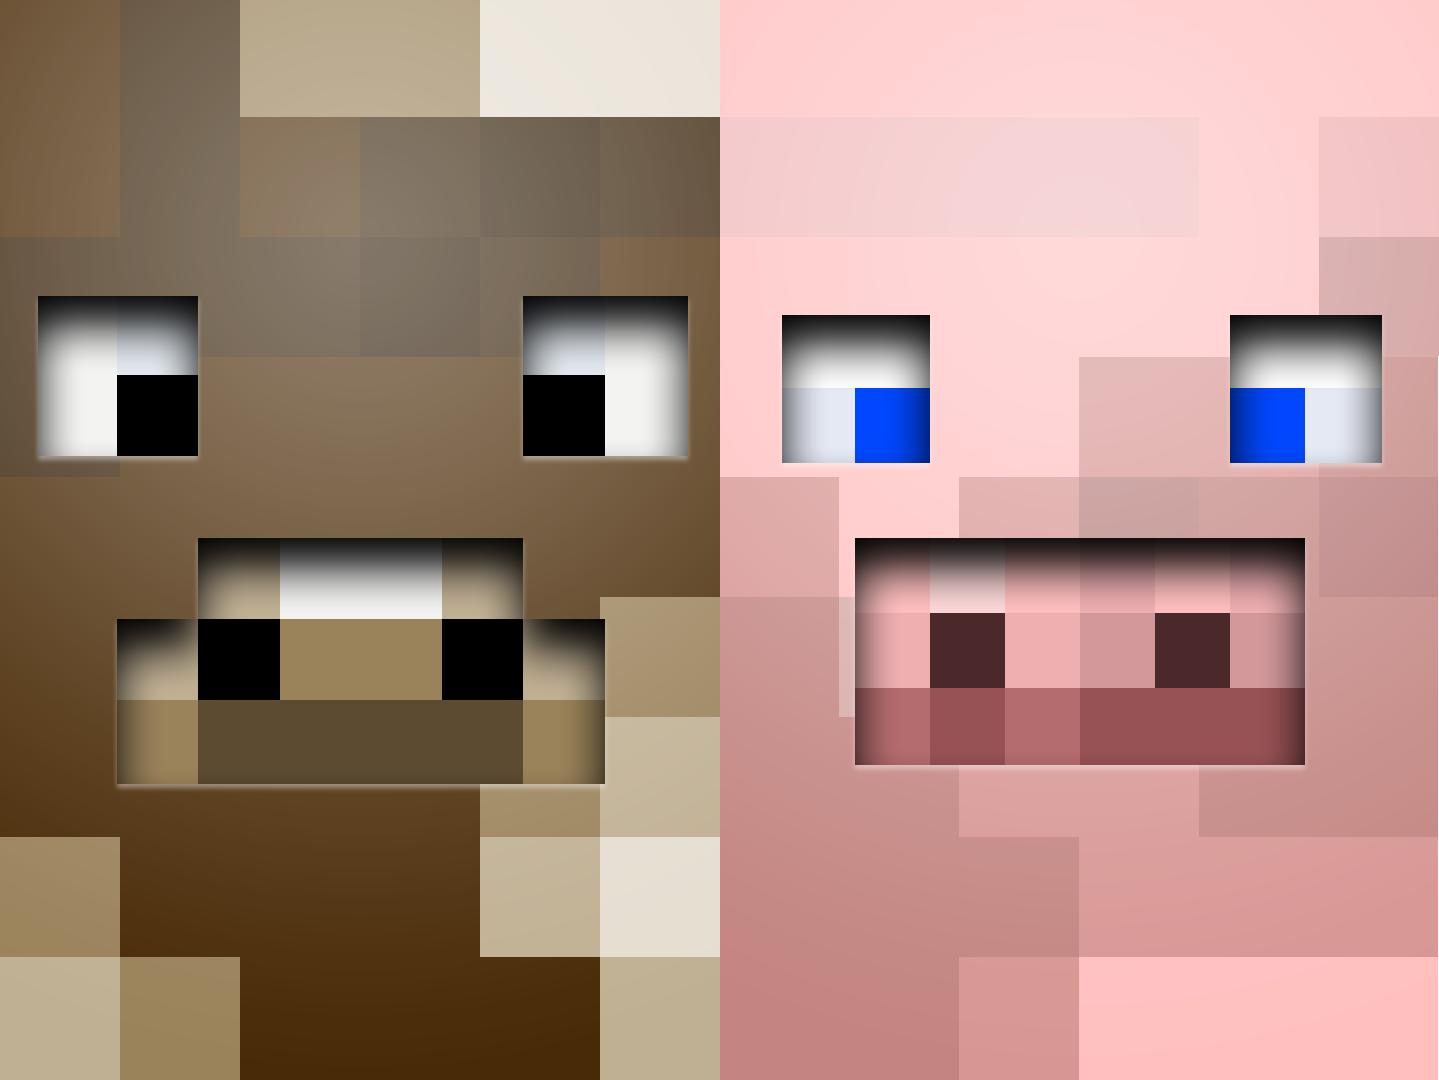 Download Minecraft Farm Wallpapers Hd By Clockworklemons 1439x1080